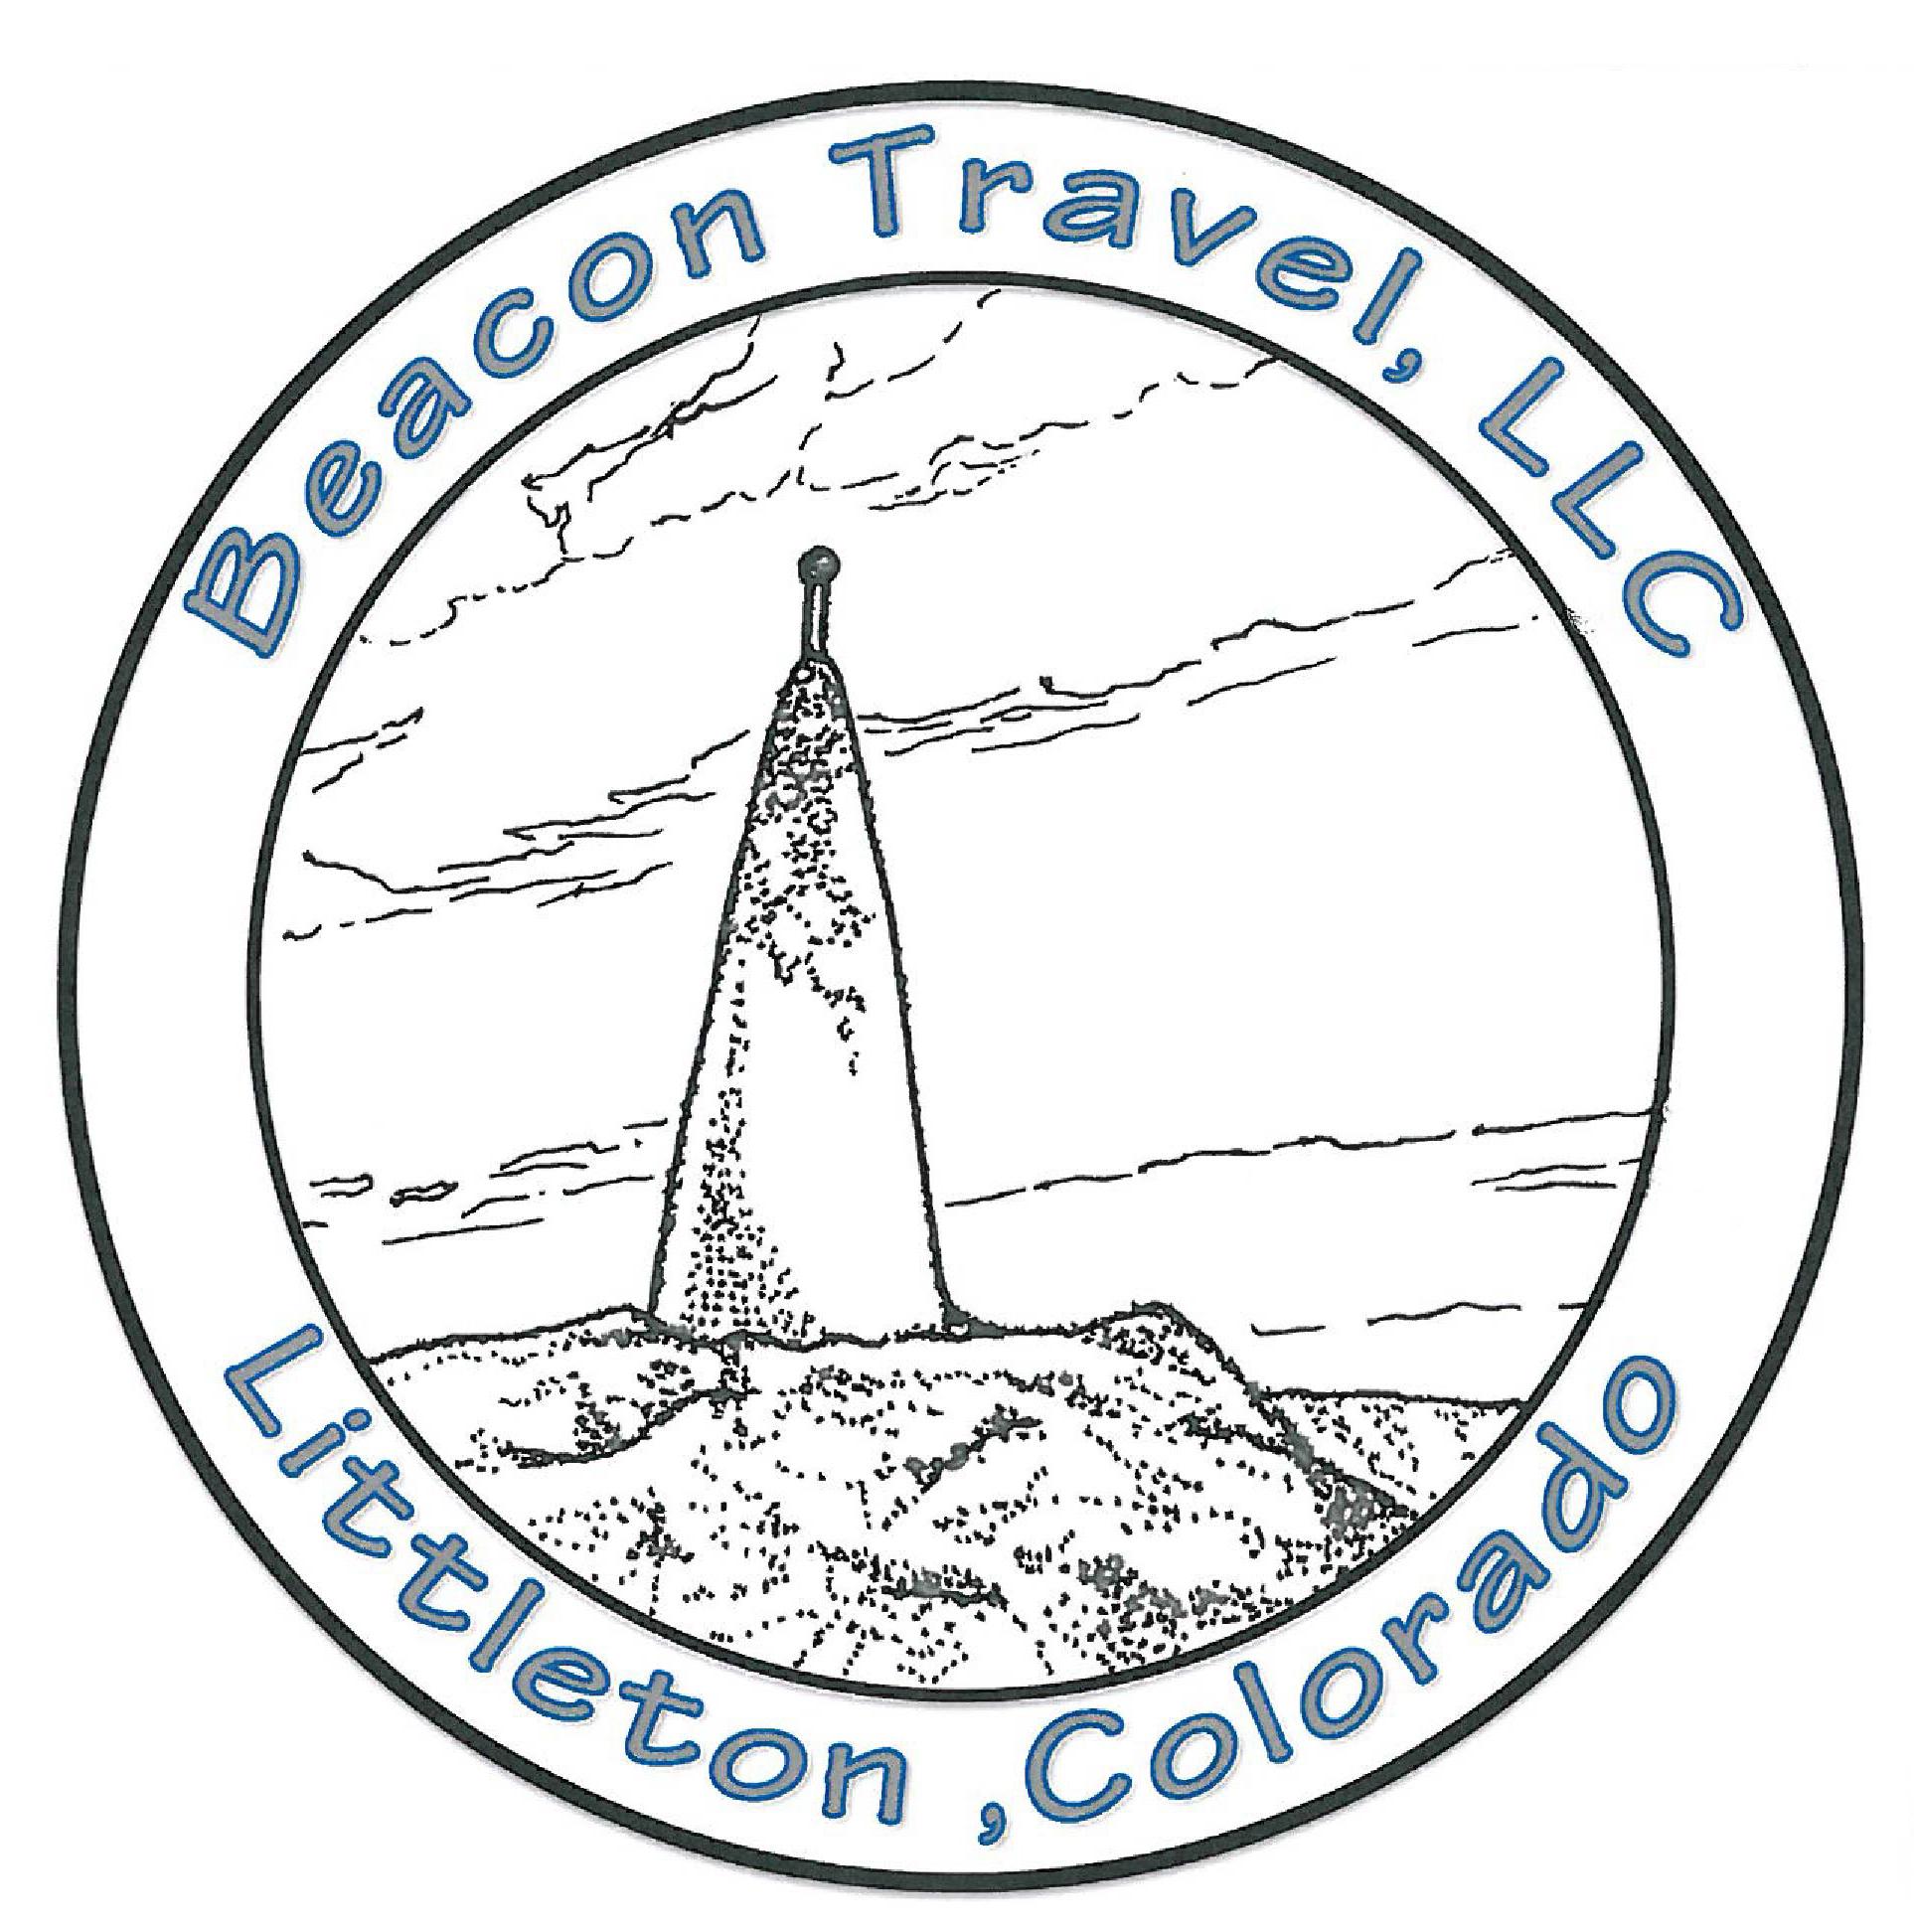 Beacon Travel LLC